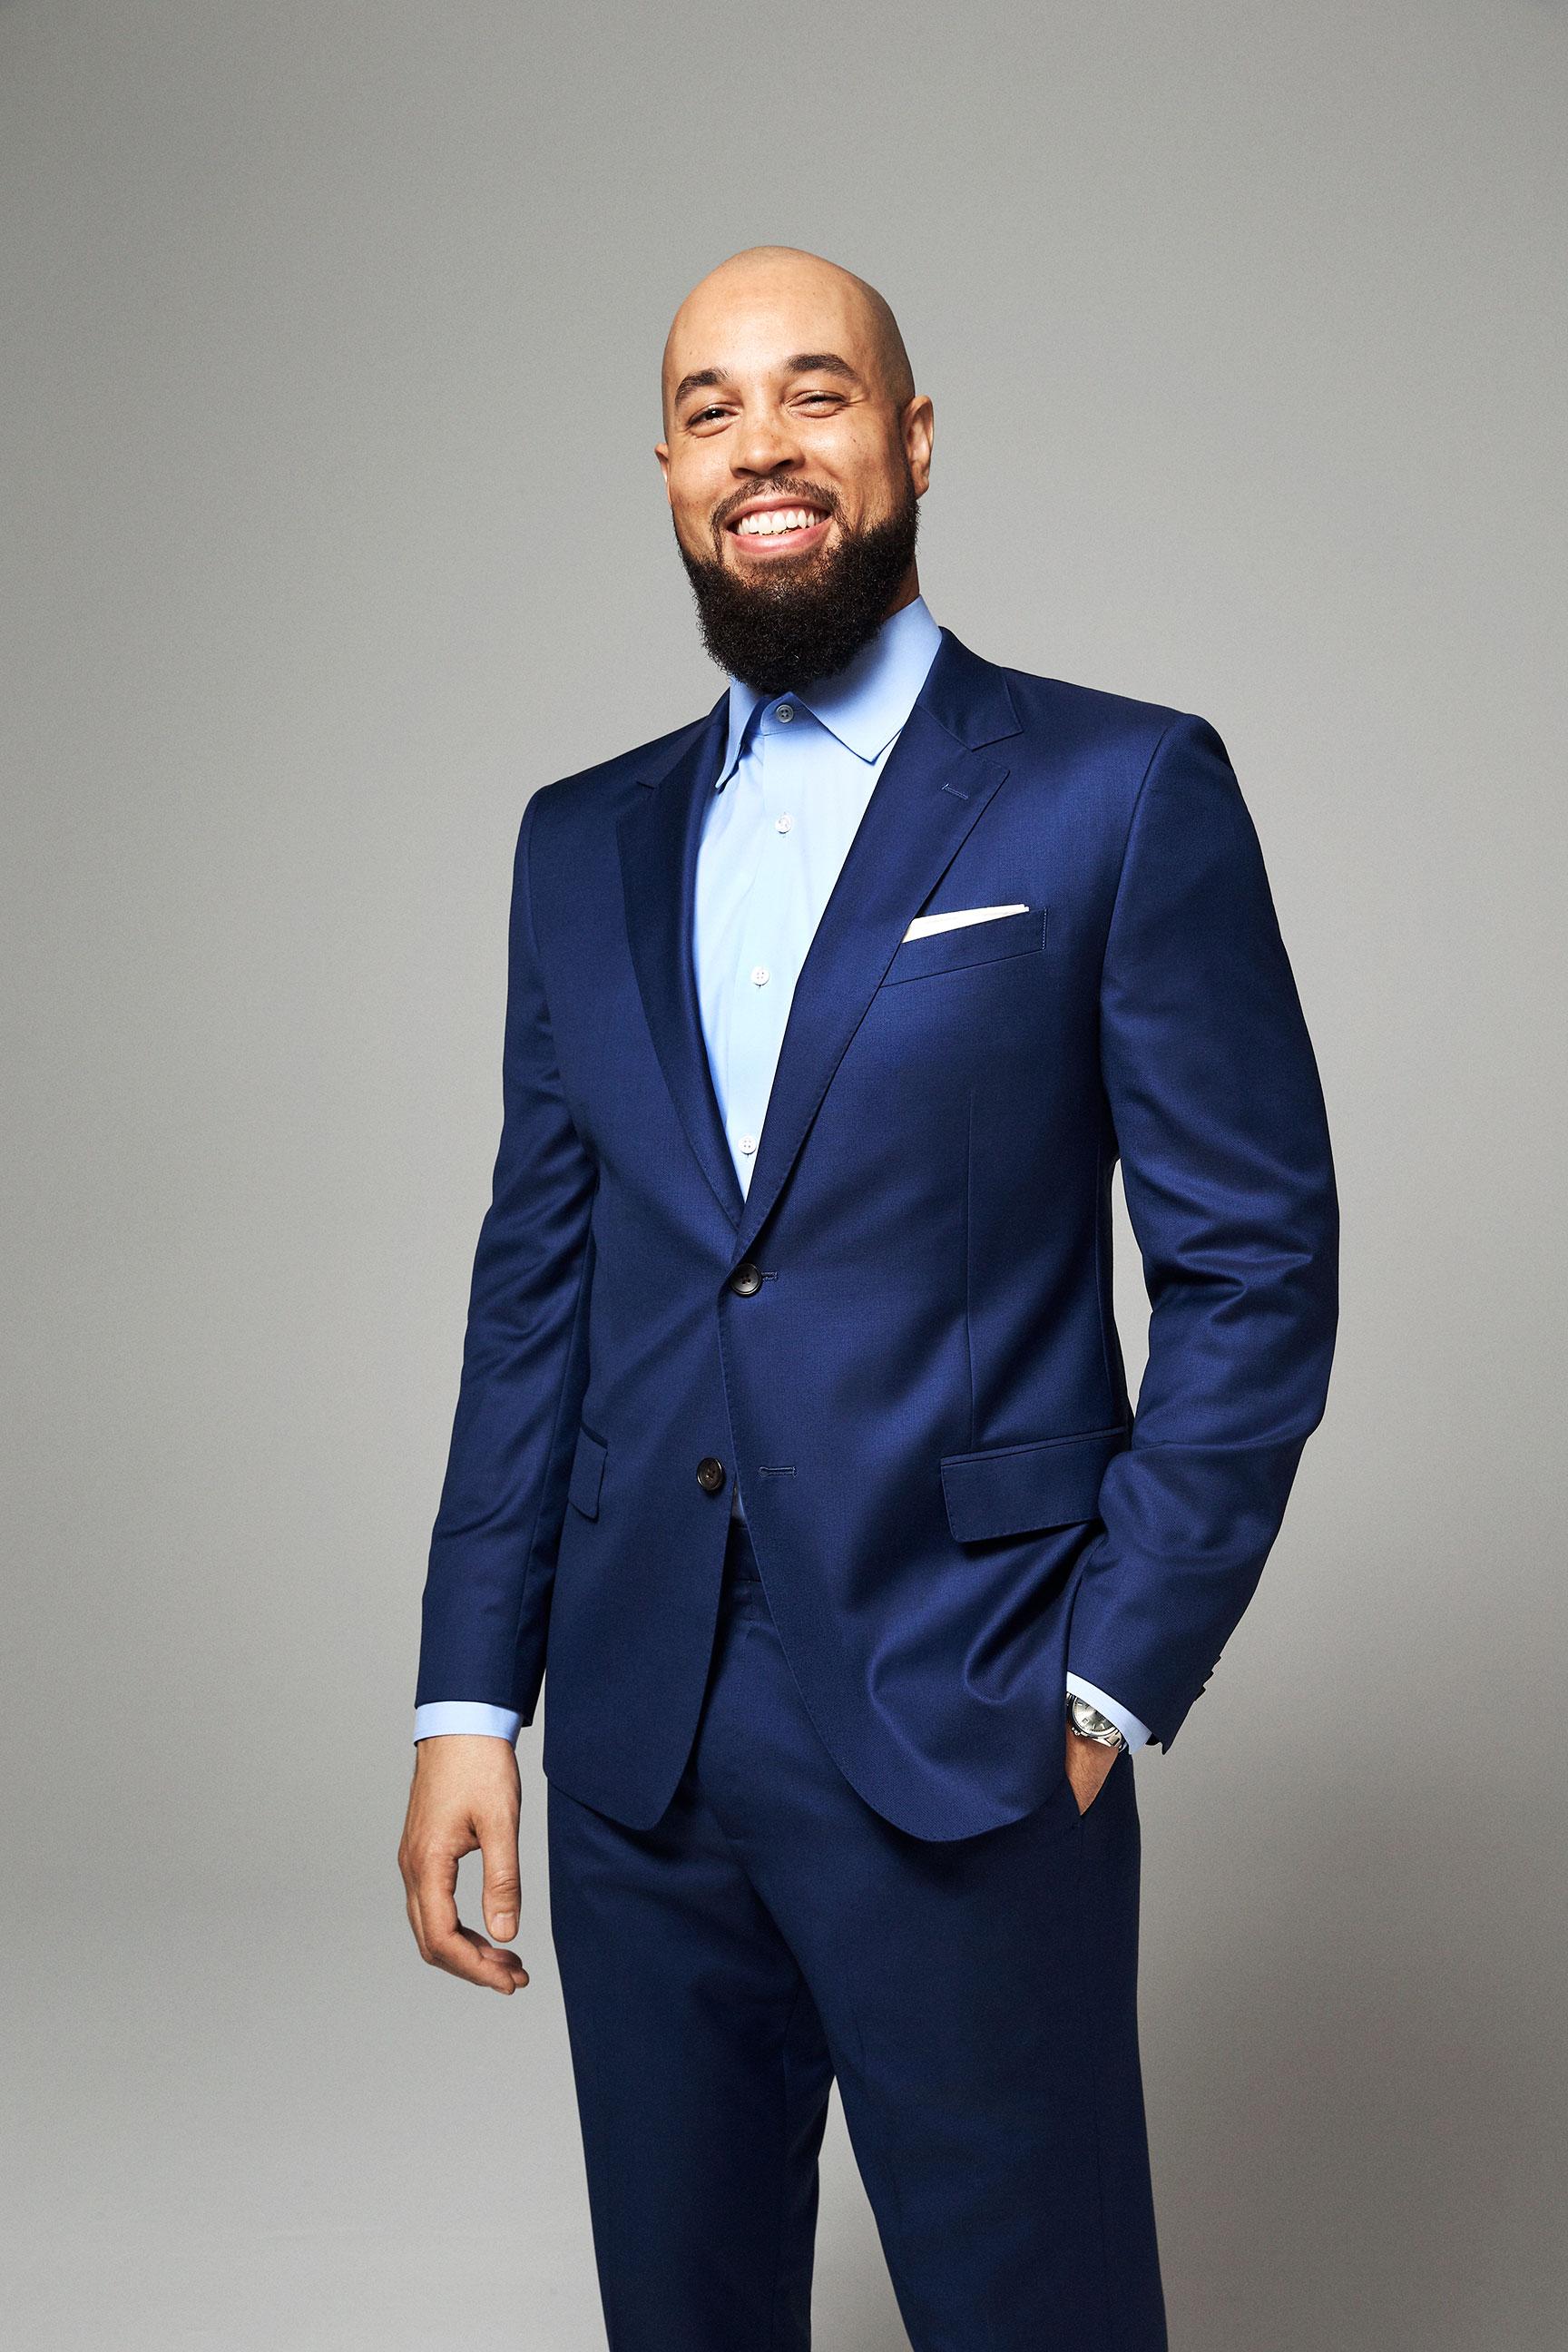 Premium Italian Wool Suit (Bright Navy)   ,    Jetsetter Stretch Dress Shirt (Solid Light Blue)   ,    Silk Twill Pocket Square (White)